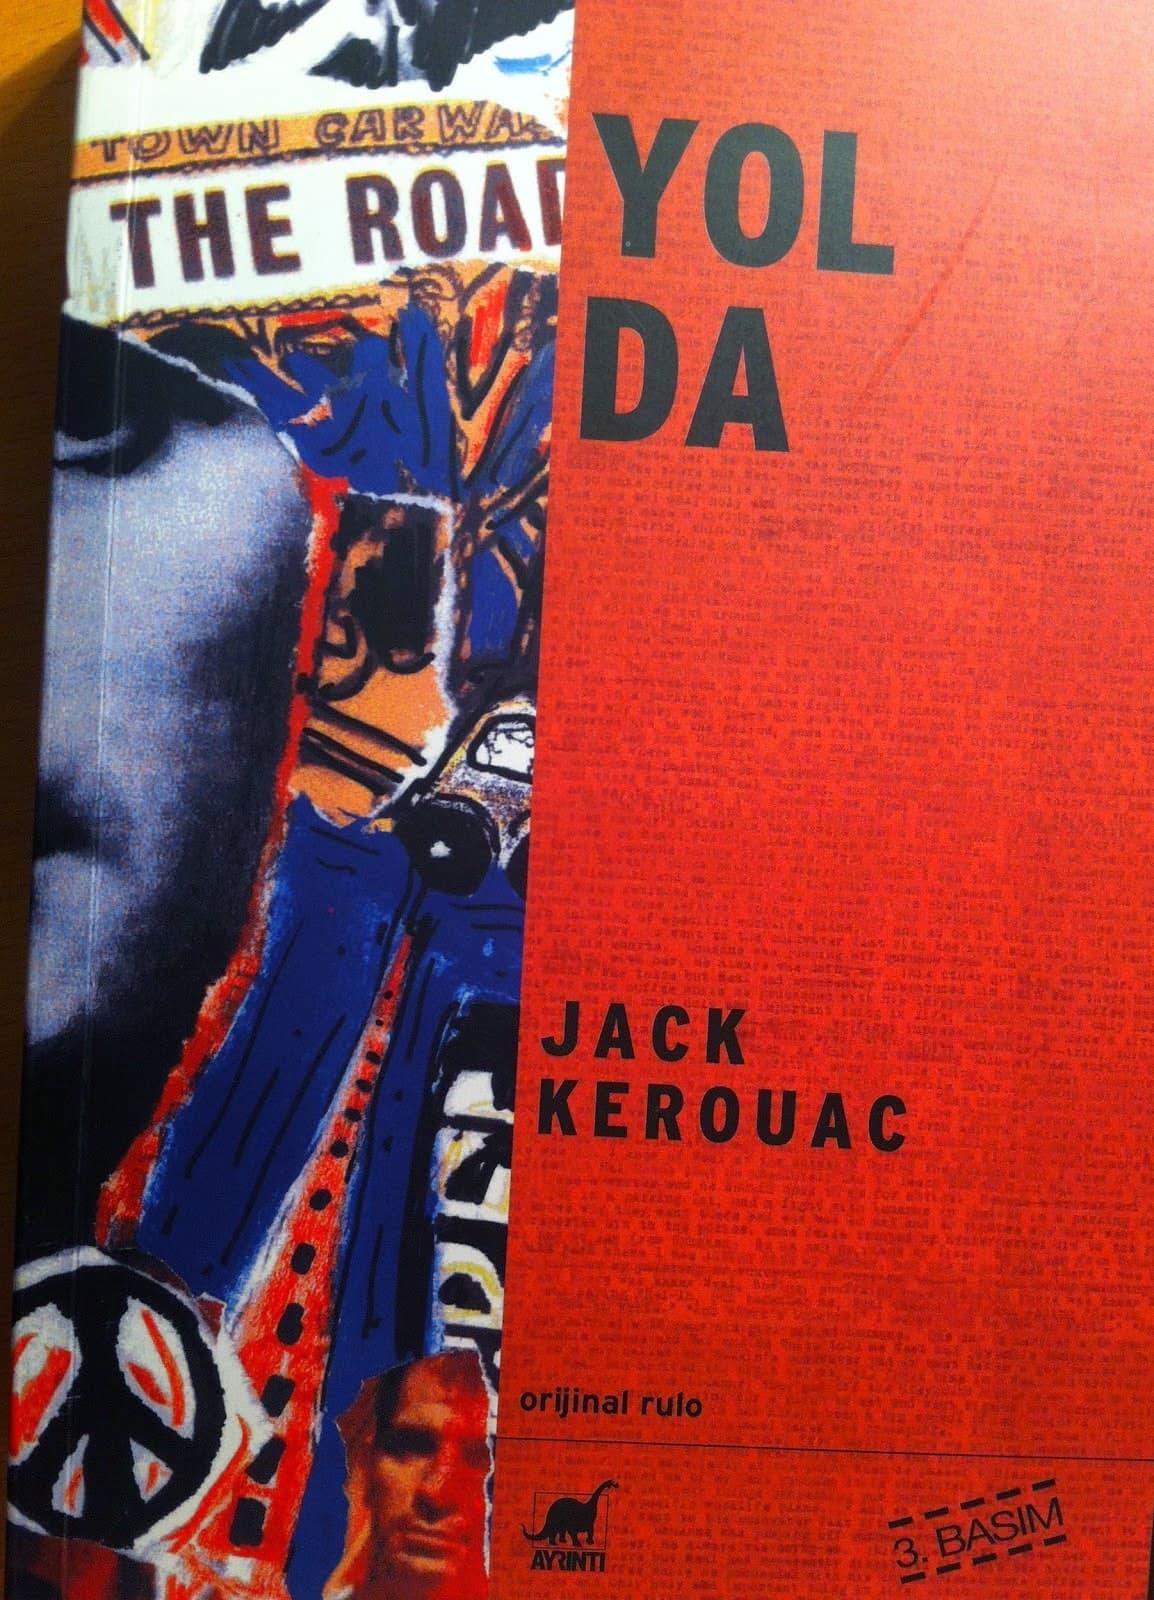 Yolda – Jack Kerouac